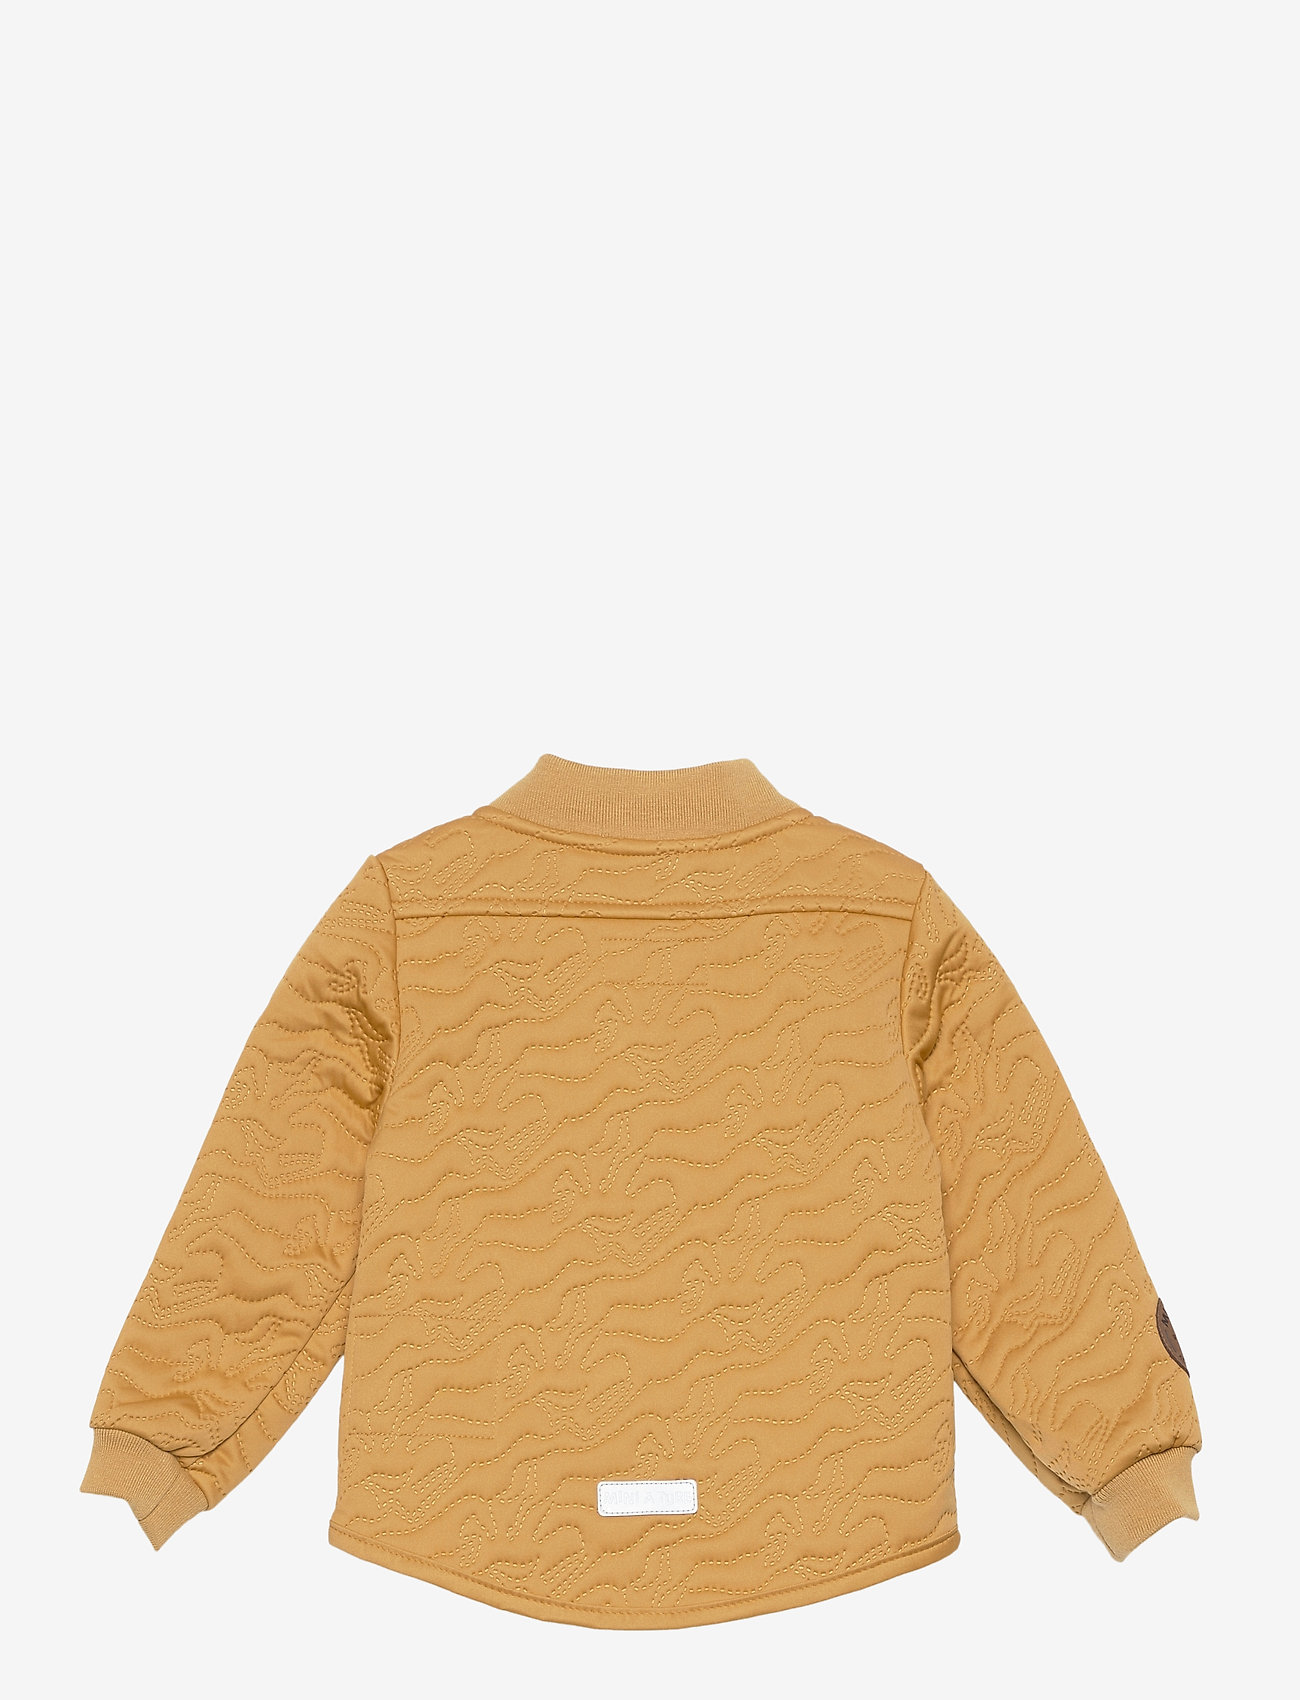 Mini A Ture - Derri Jacket, MK - coveralls - honey yellow - 1